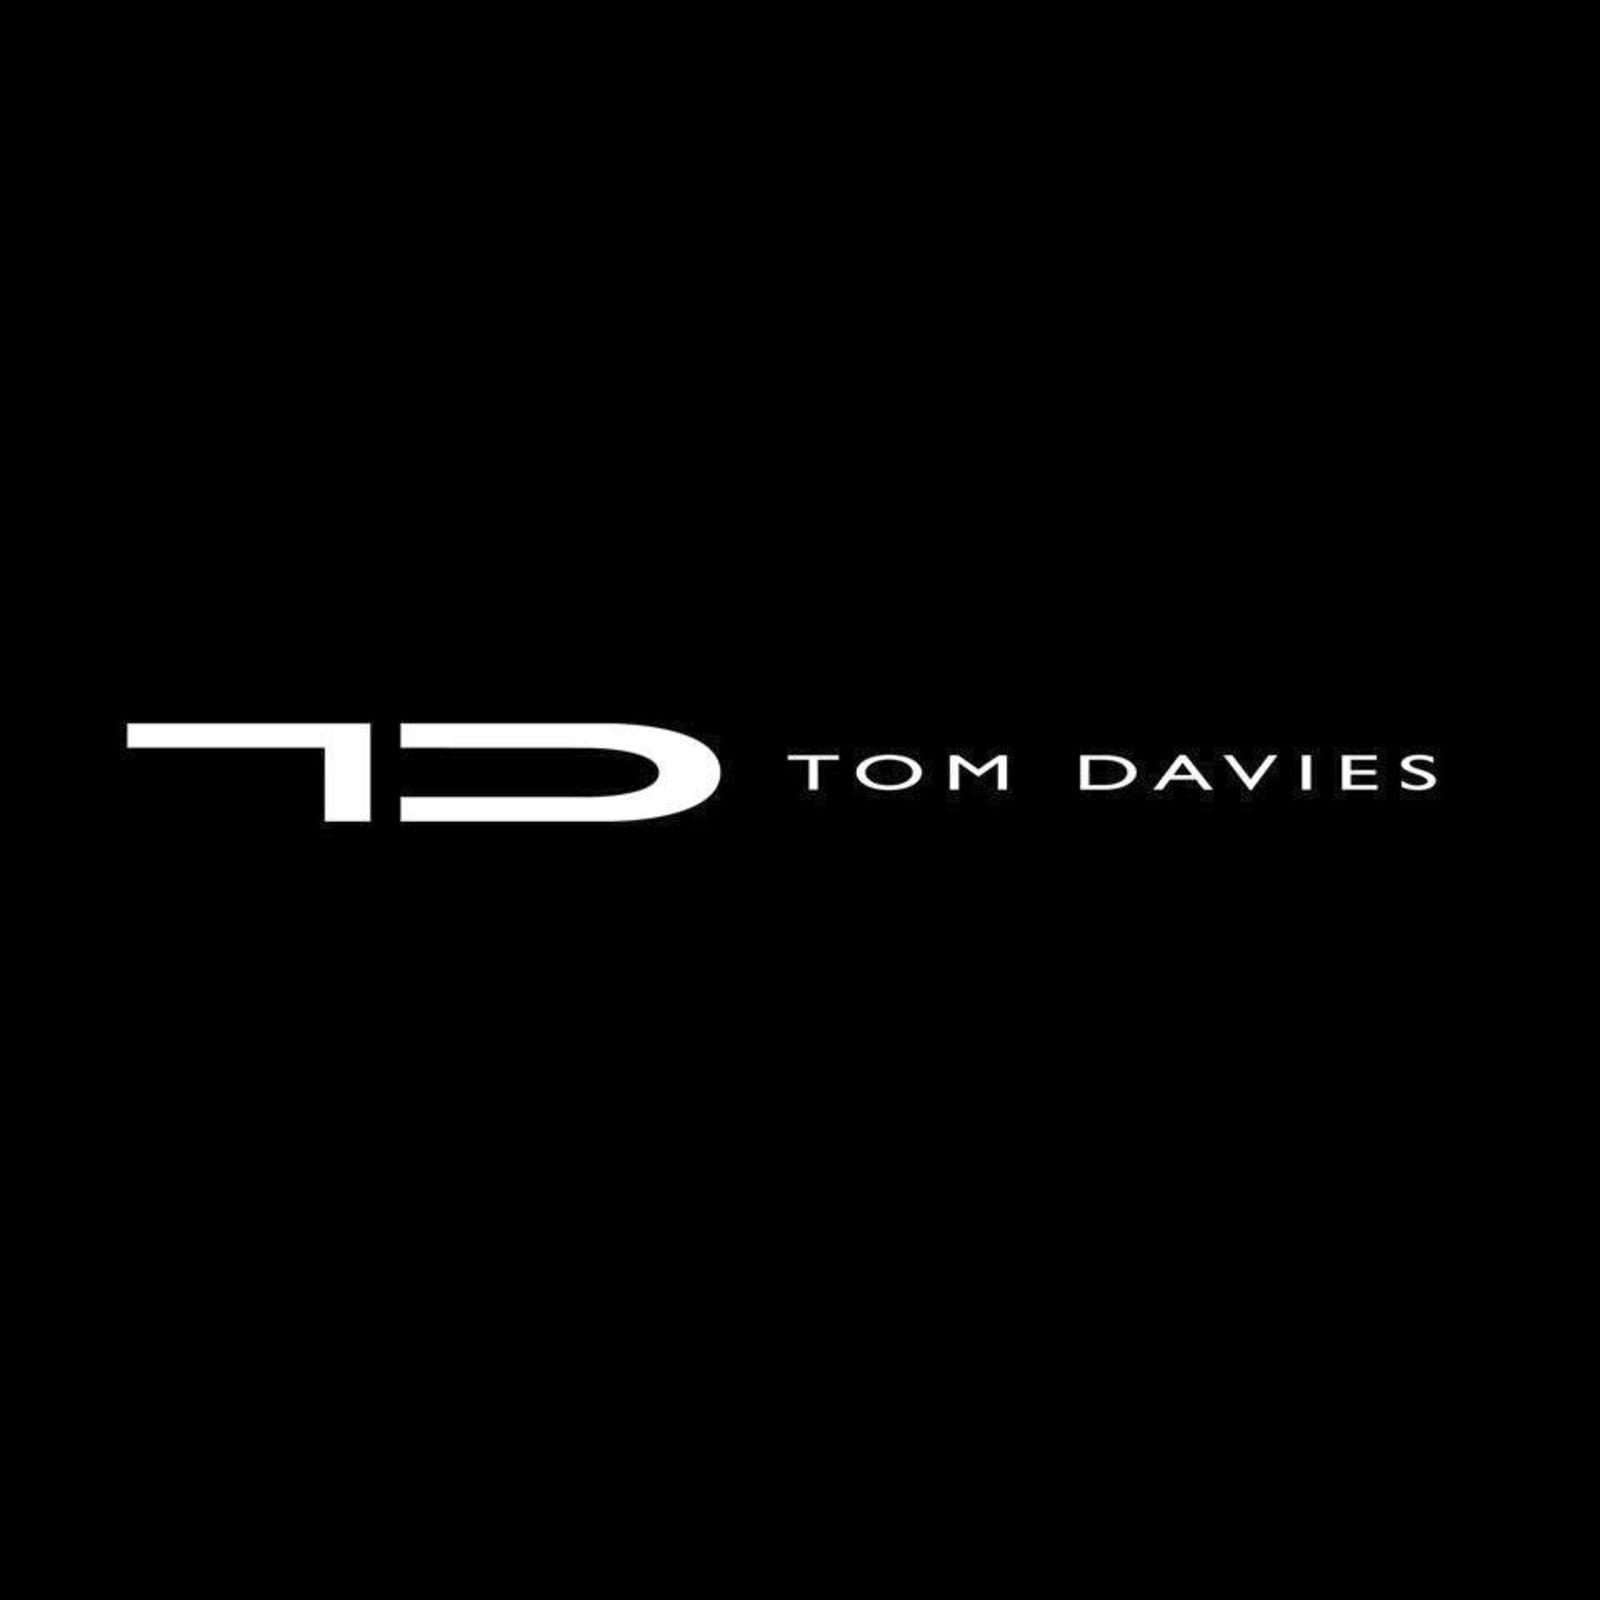 TD TOM DAVIES